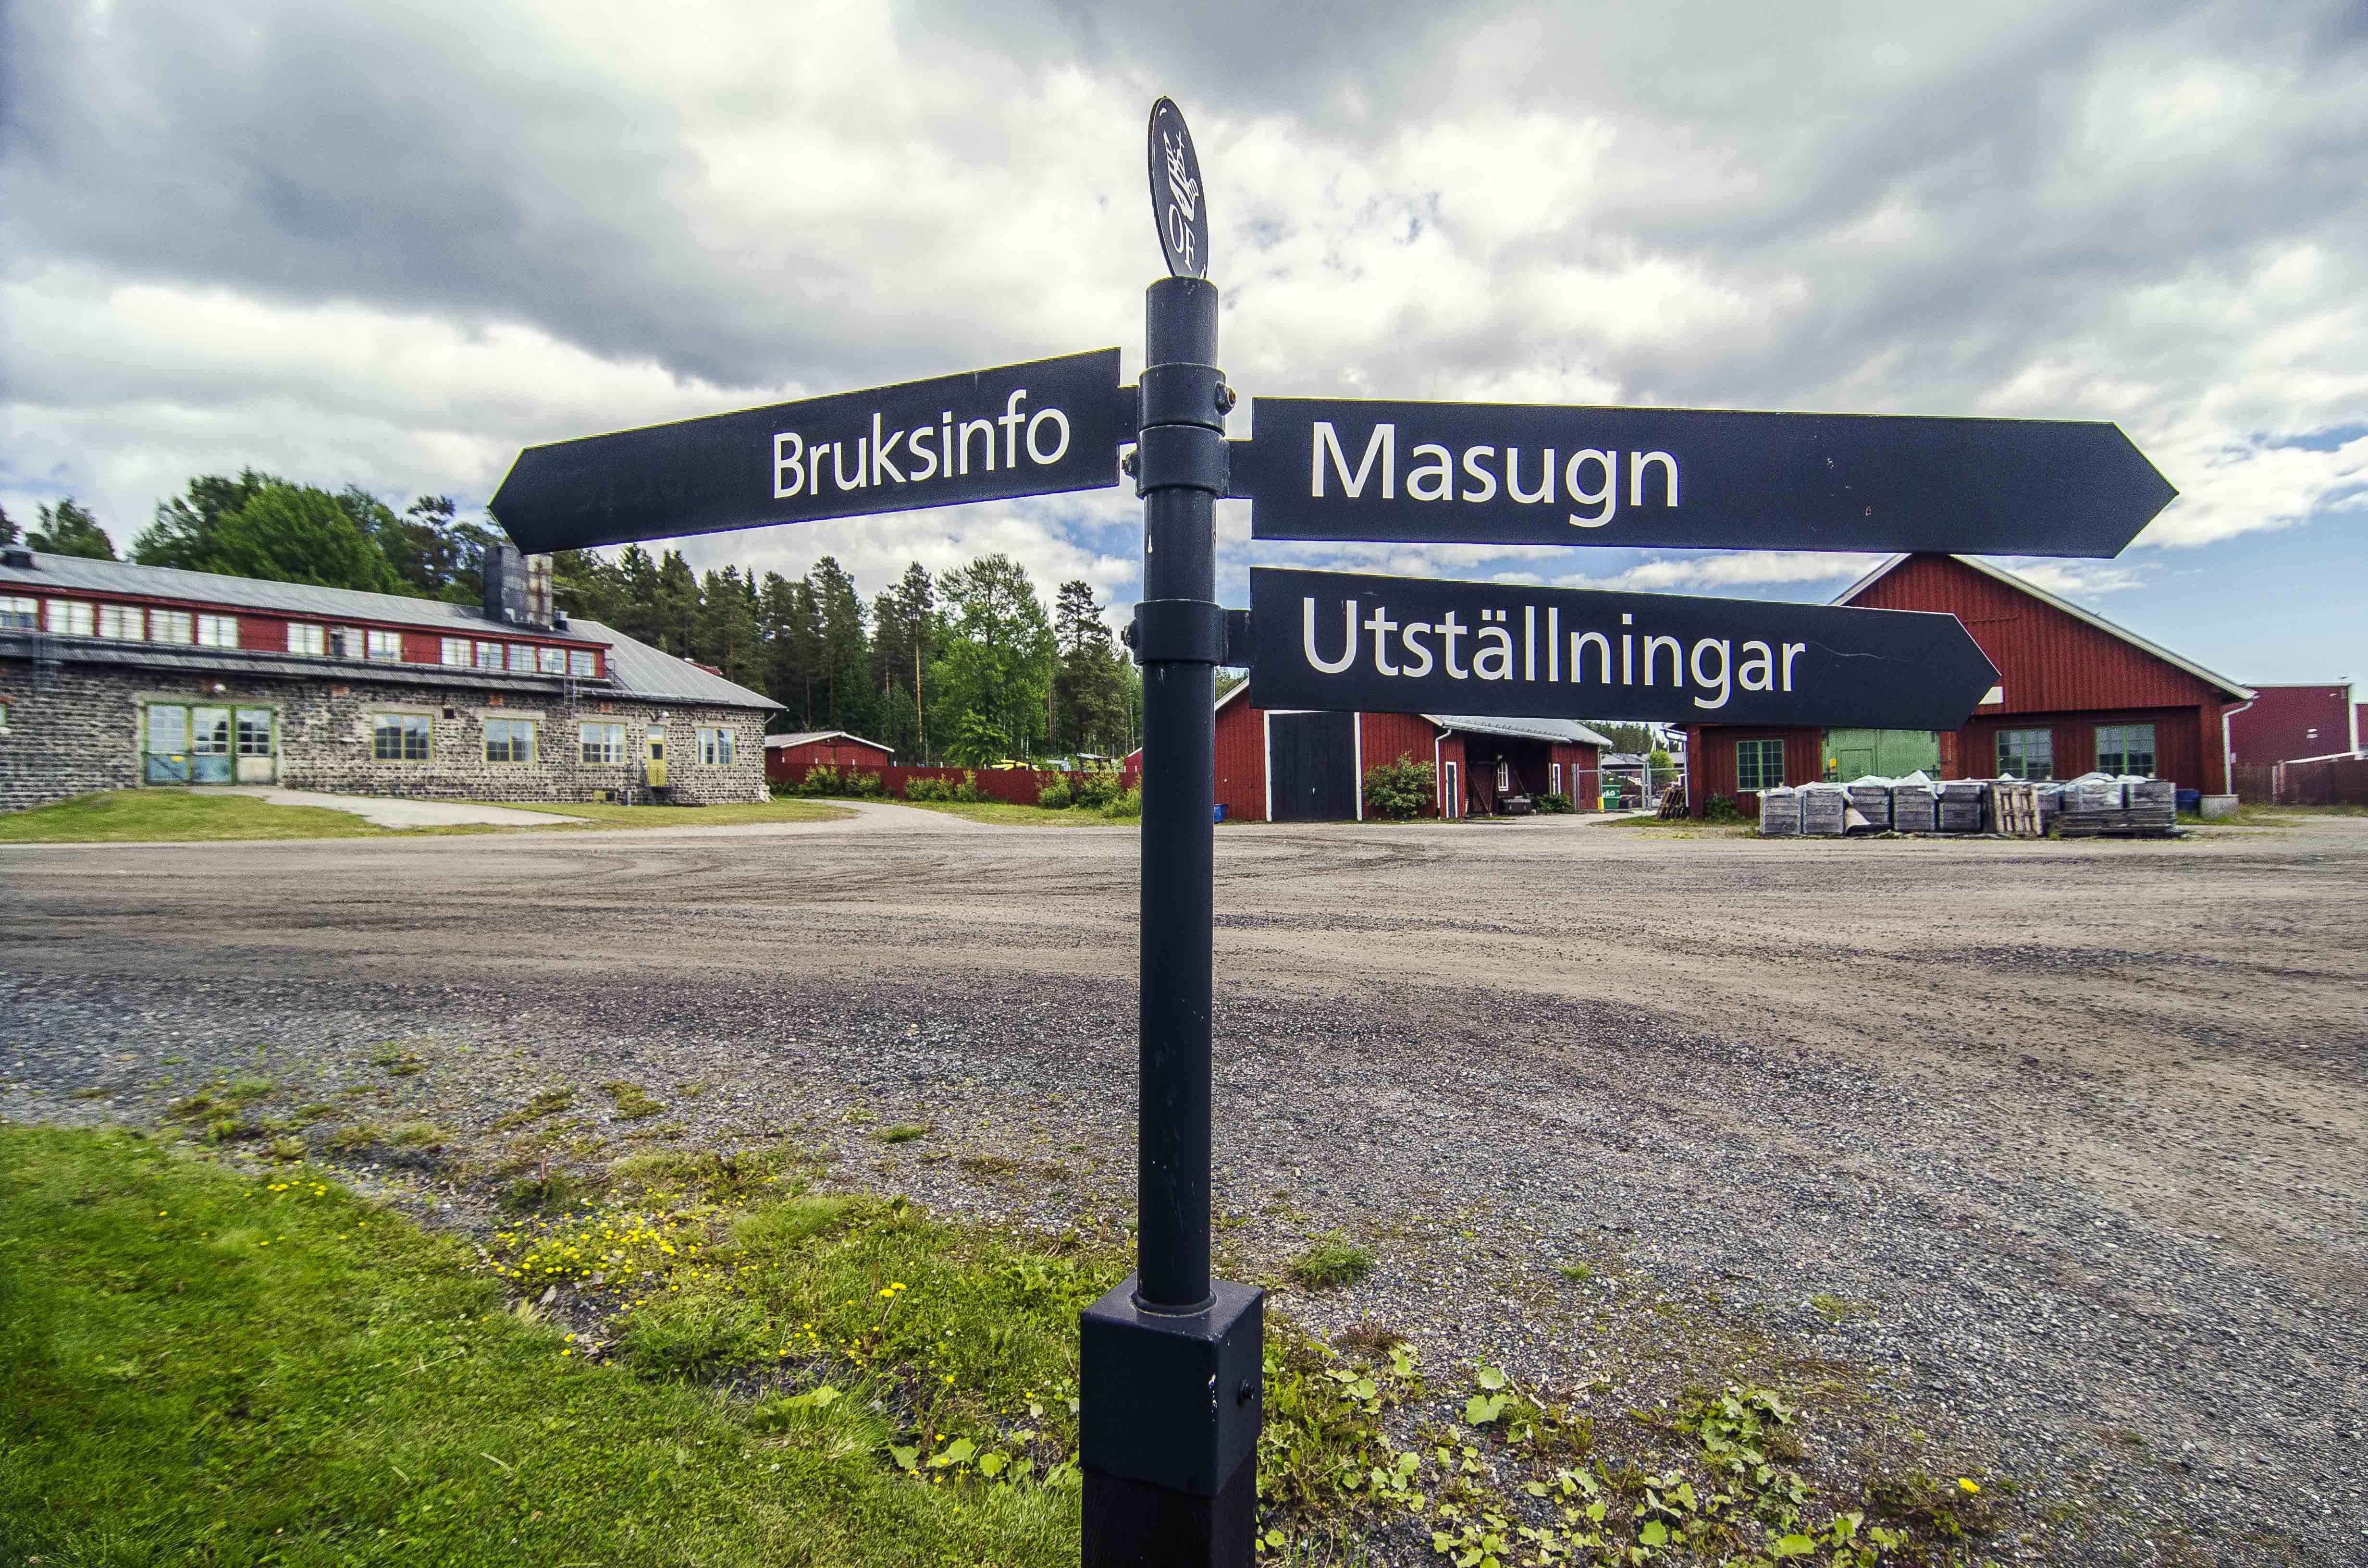 Olofsfors Manor